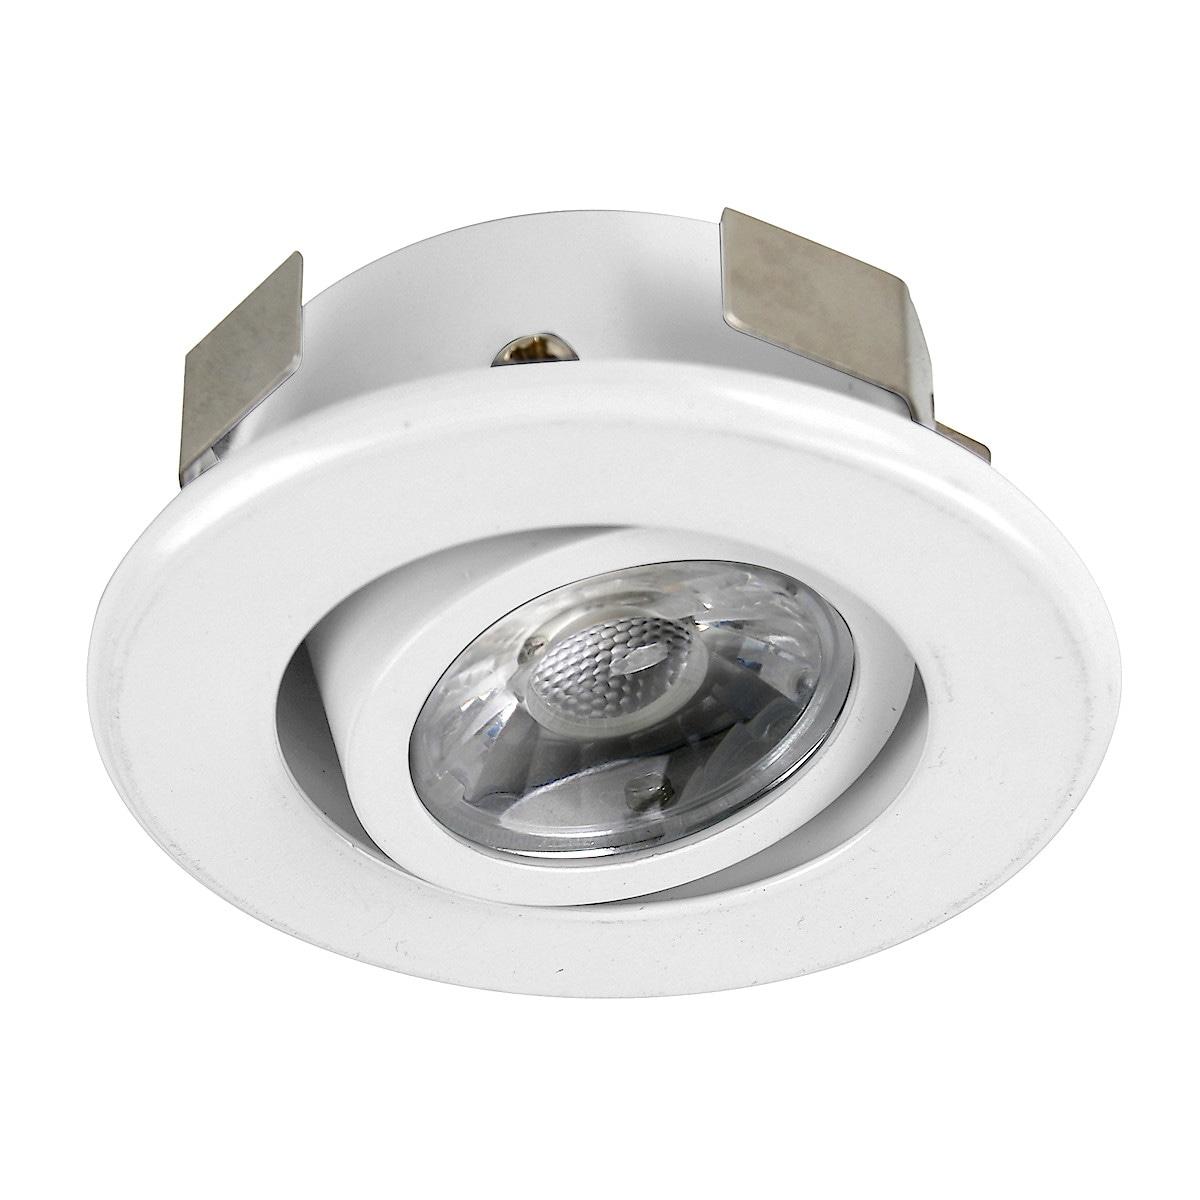 Downlights LED 3-pack Northlight